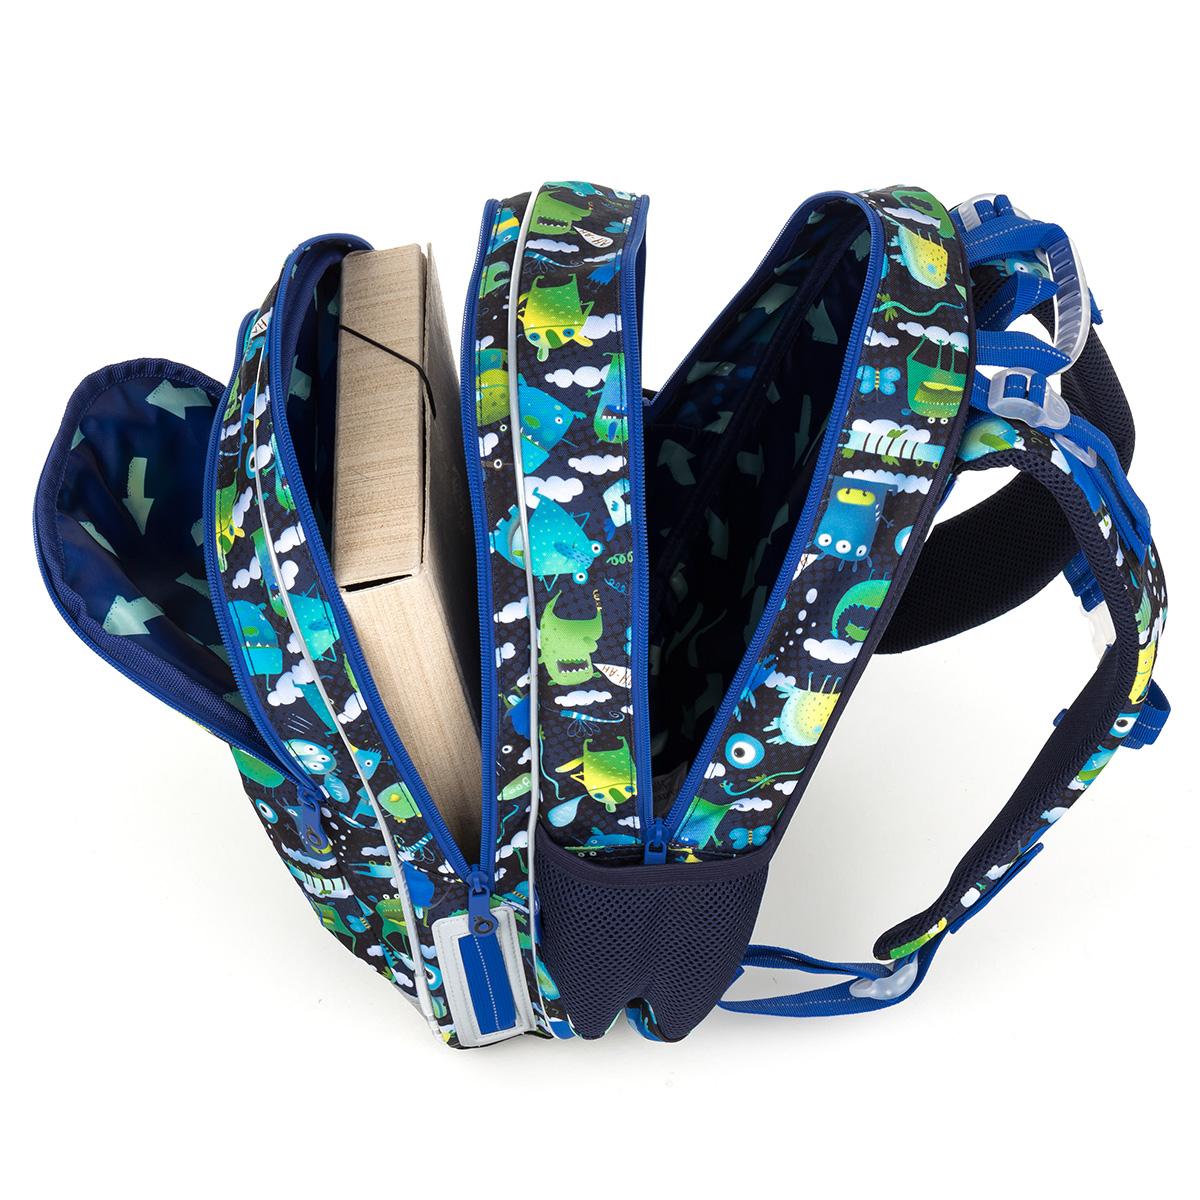 Školní batoh Topgal ELLY 18002 B